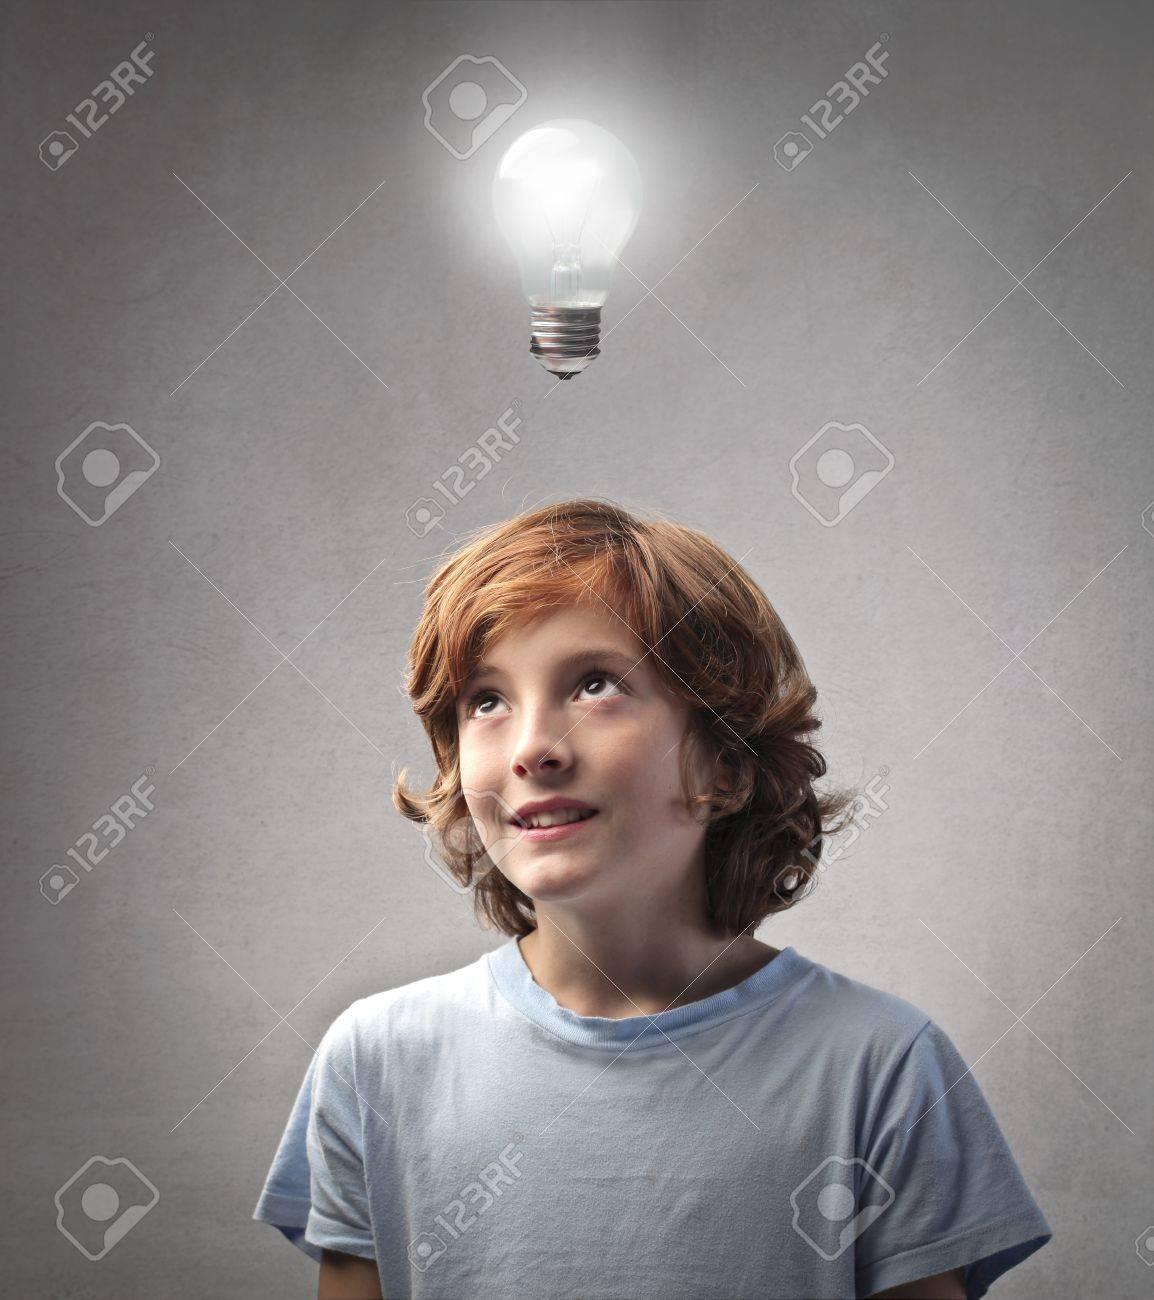 Smiling child having an idea Stock Photo - 11309302